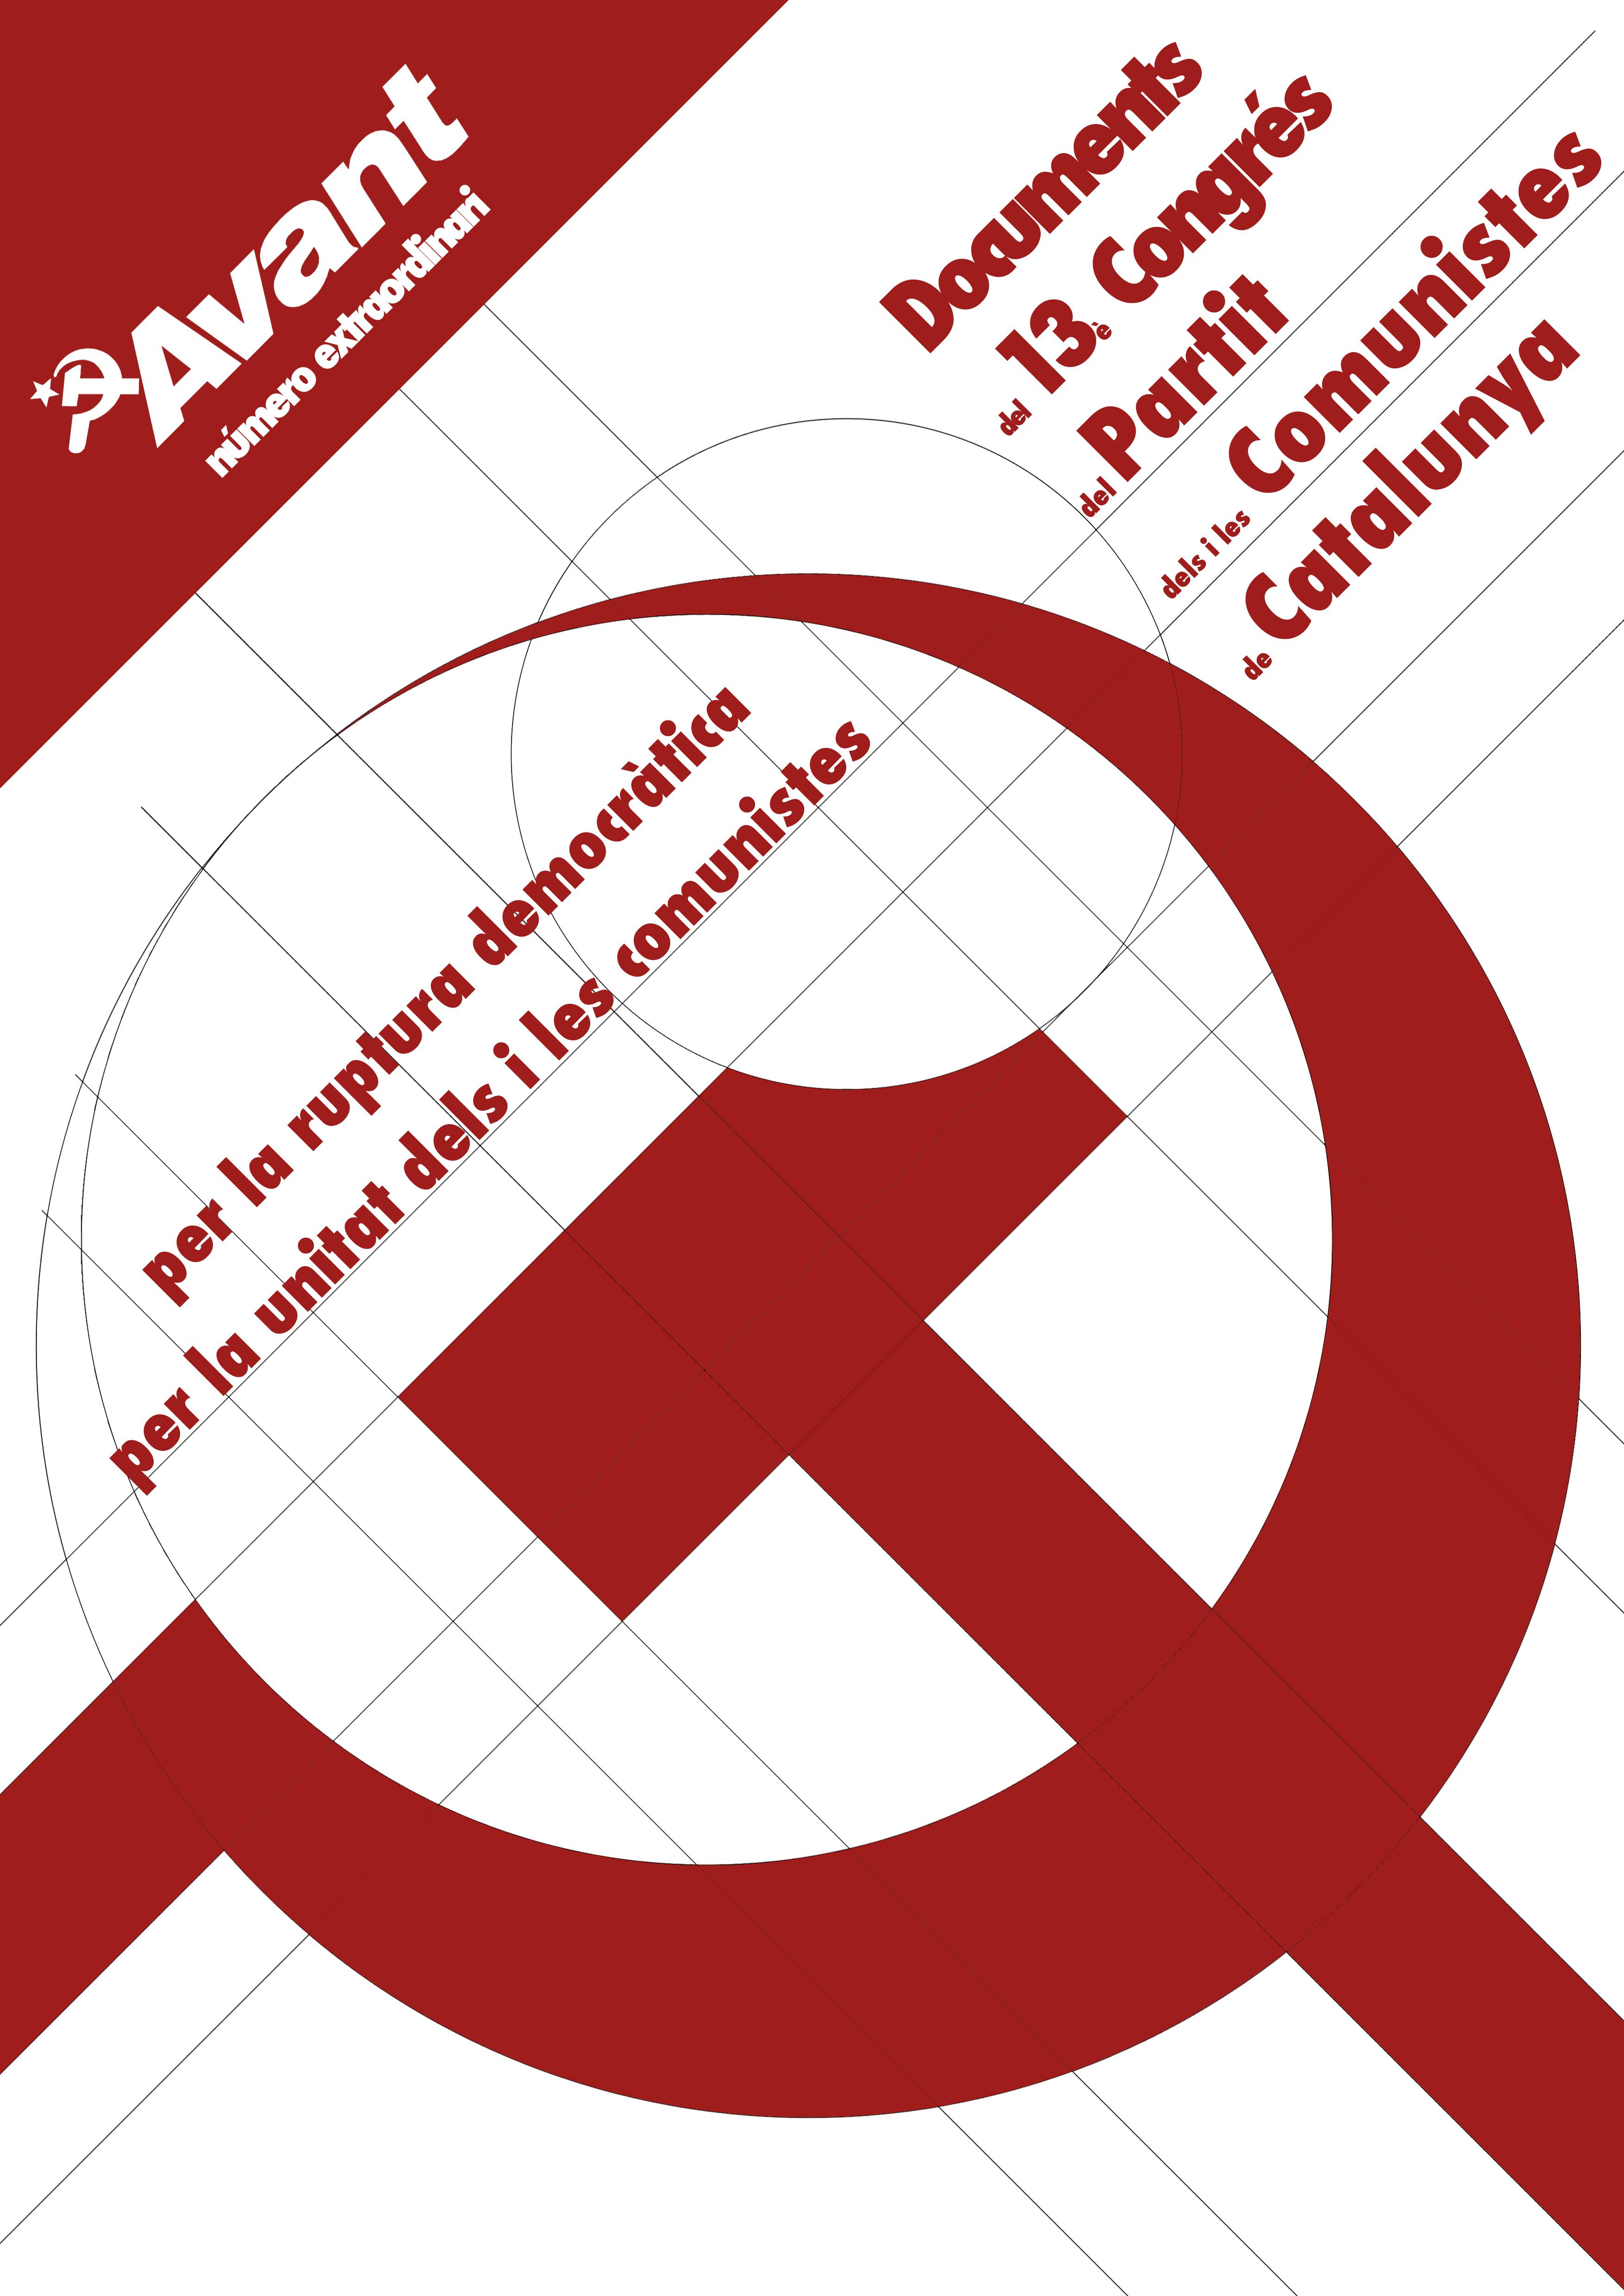 Documents 13 congrés del PCC en català